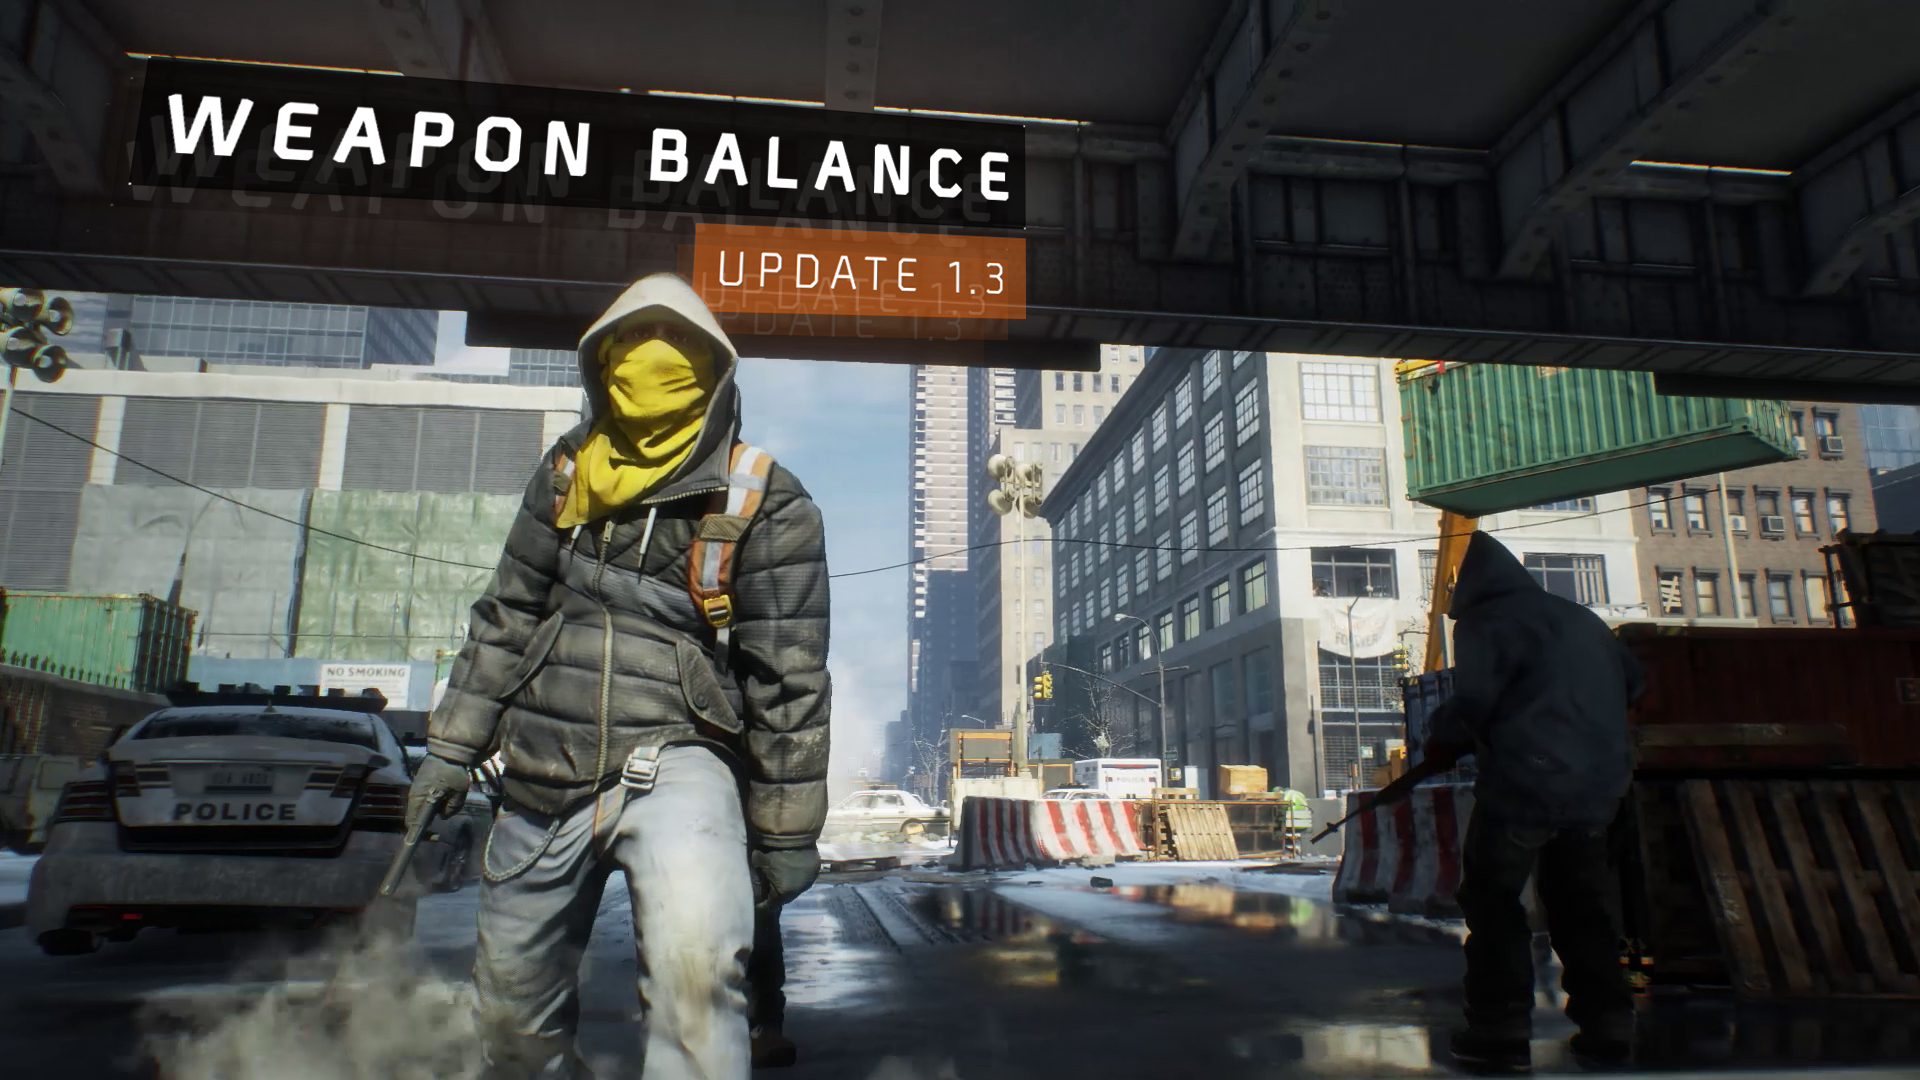 [2016-06-23] Weapon balance header